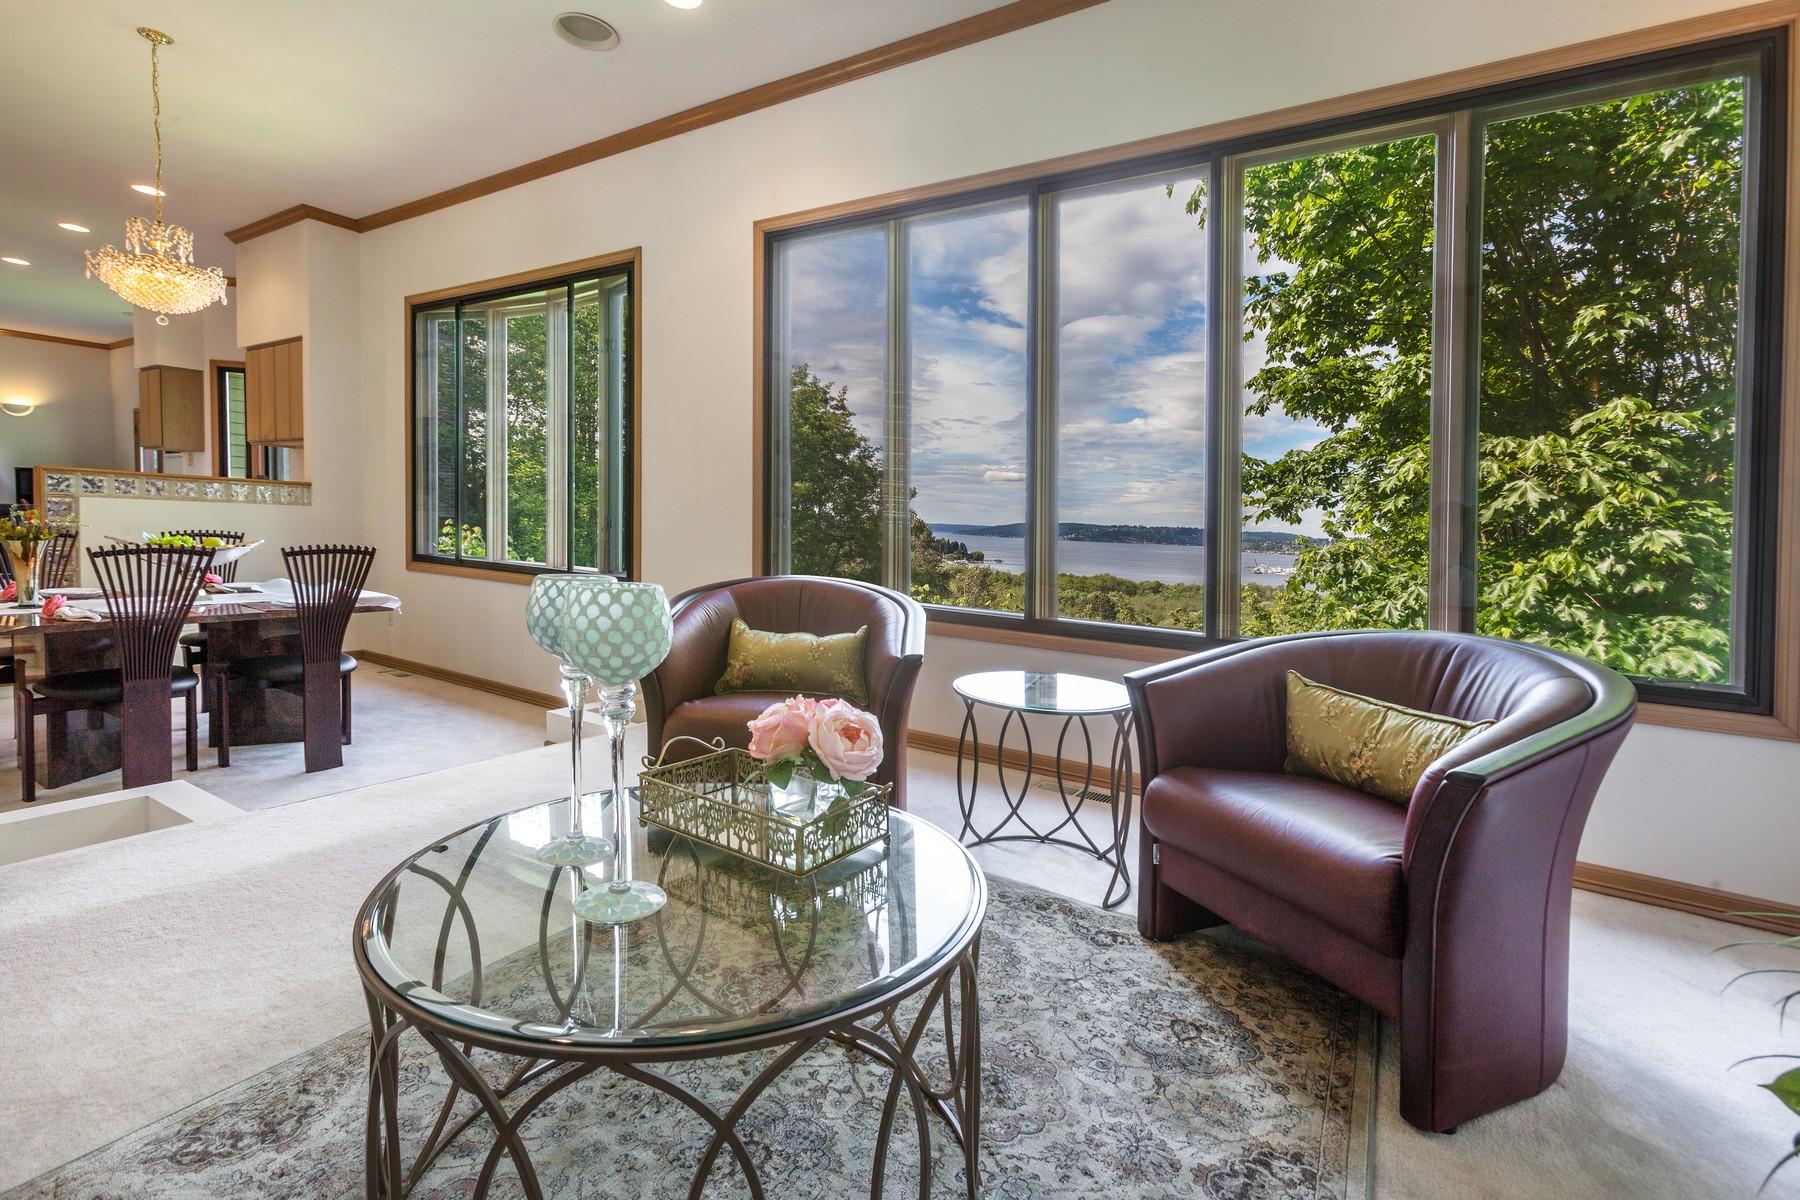 Additional photo for property listing at Clyde Hill Contemporary 9836 NE 34th Pl Bellevue, Вашингтон 98004 Соединенные Штаты